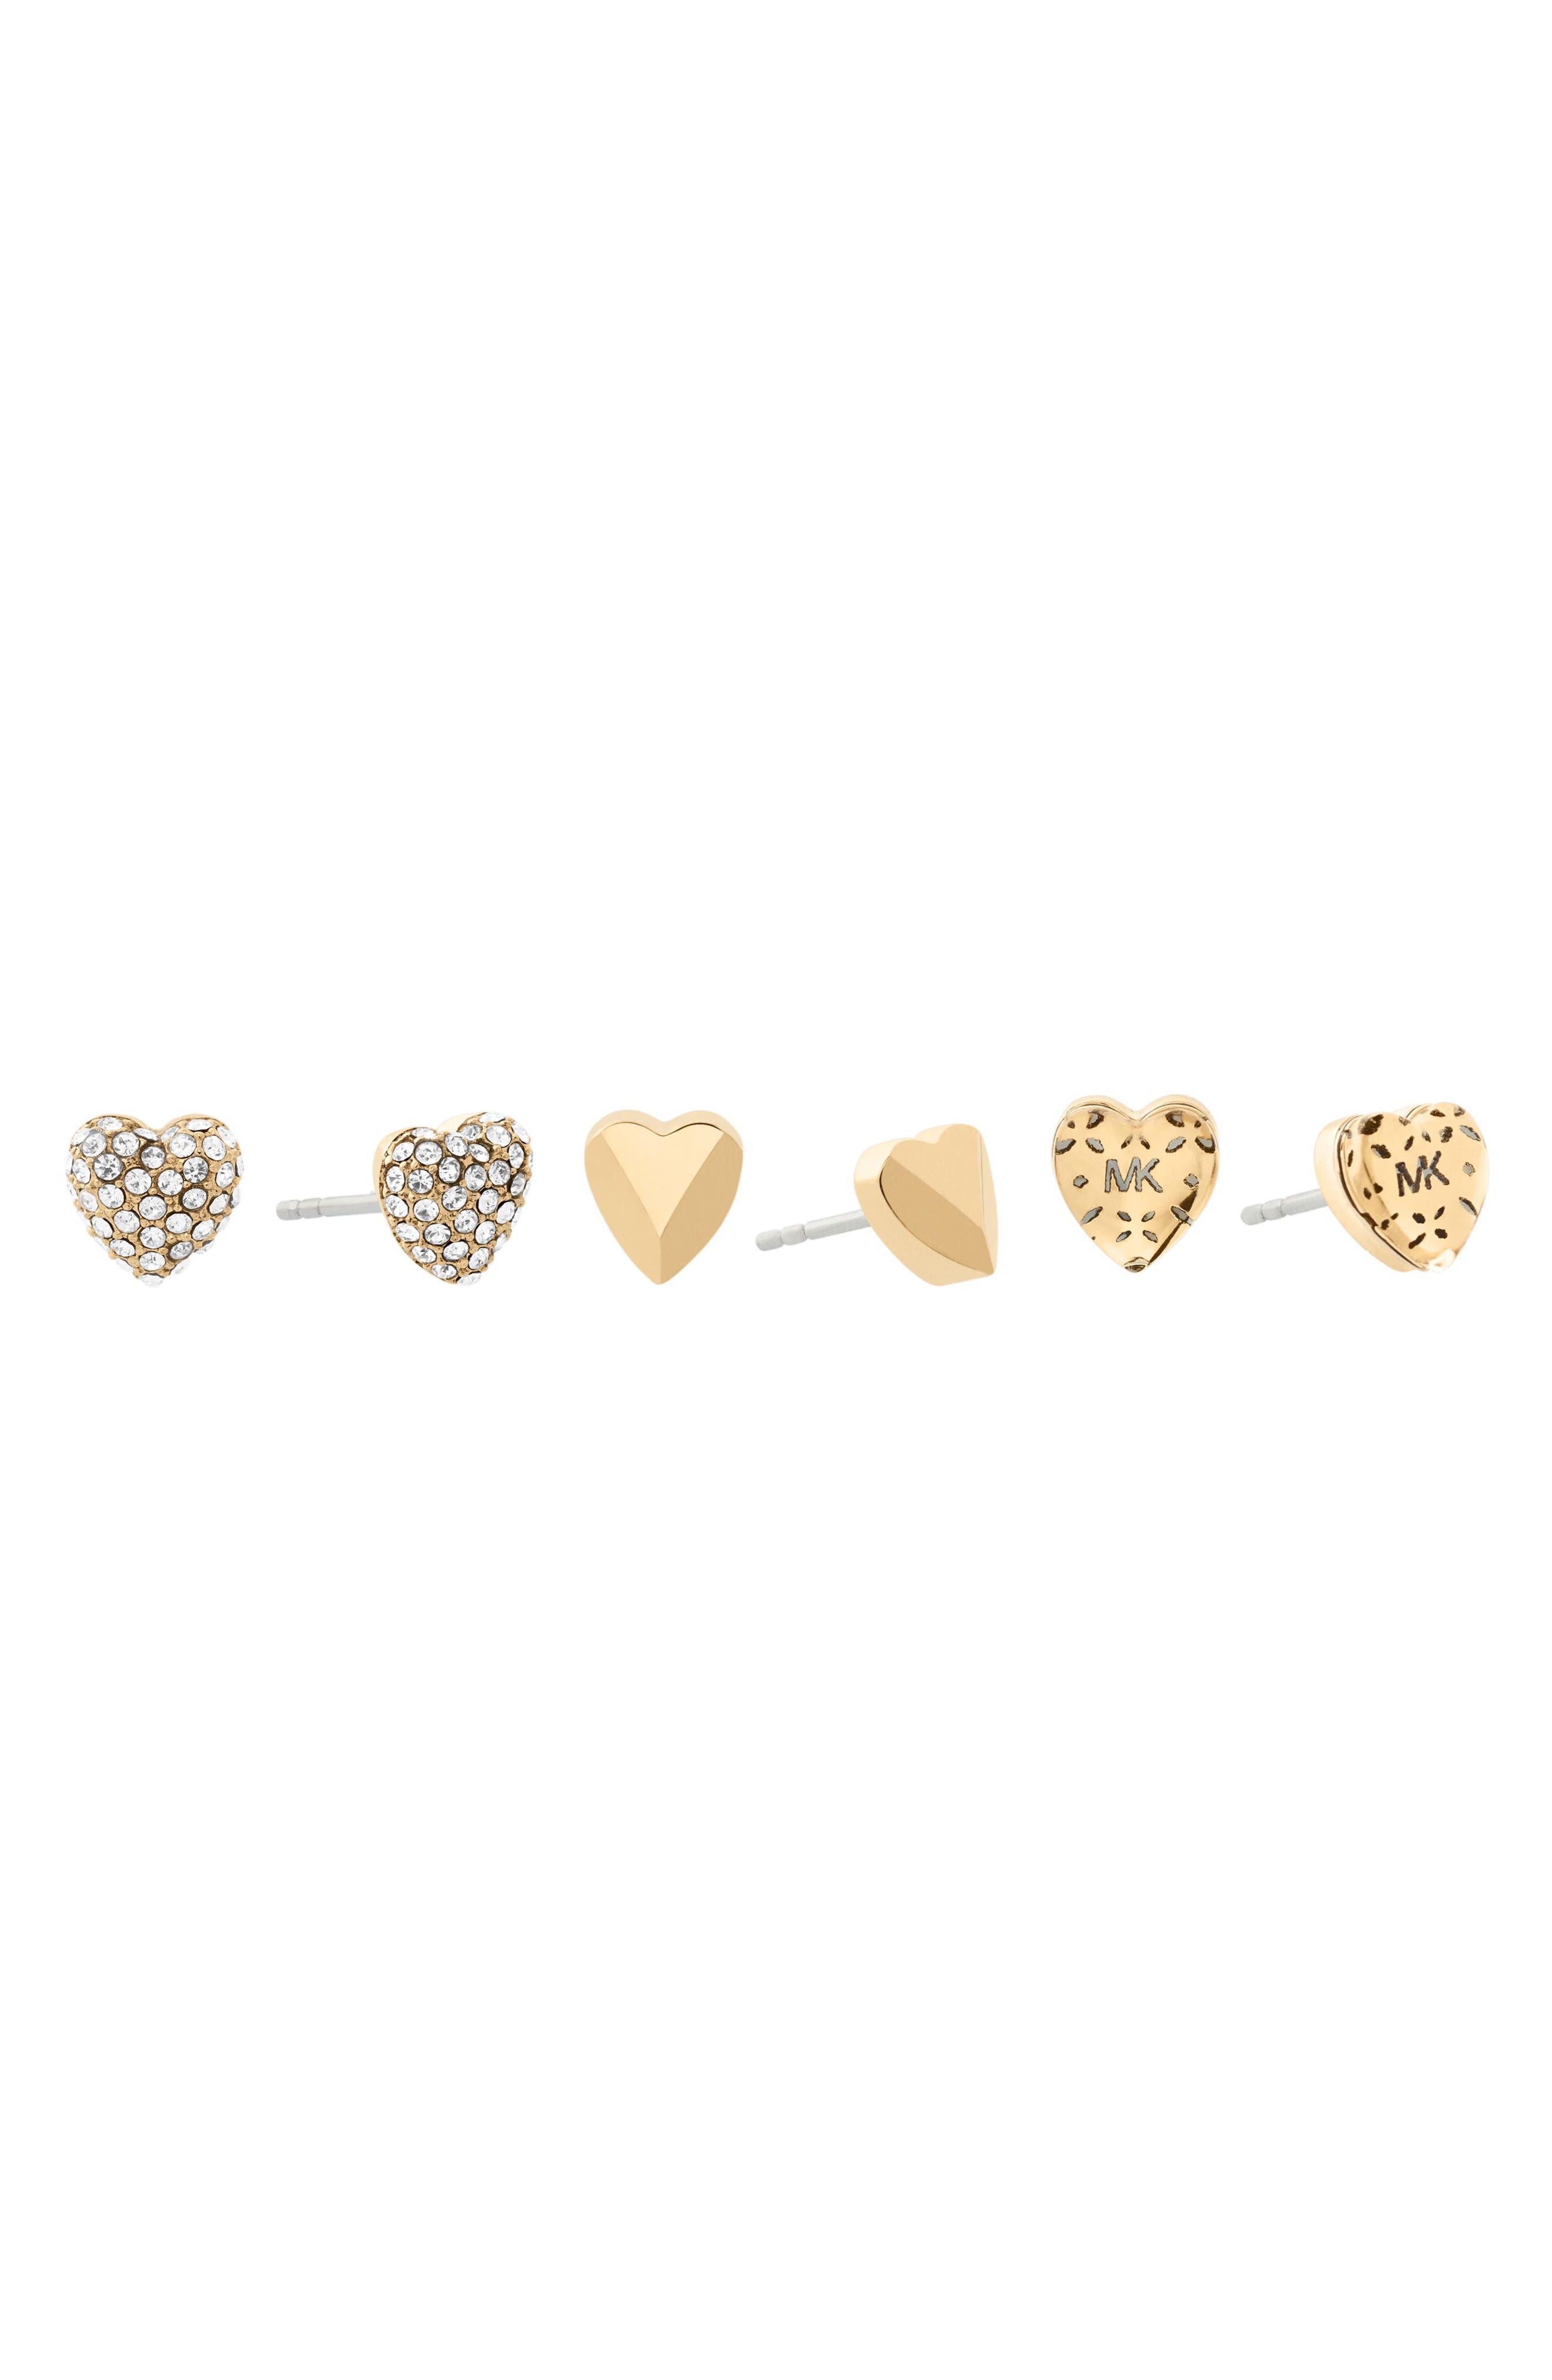 Set of 3 Stud Earrings,                             Alternate thumbnail 6, color,